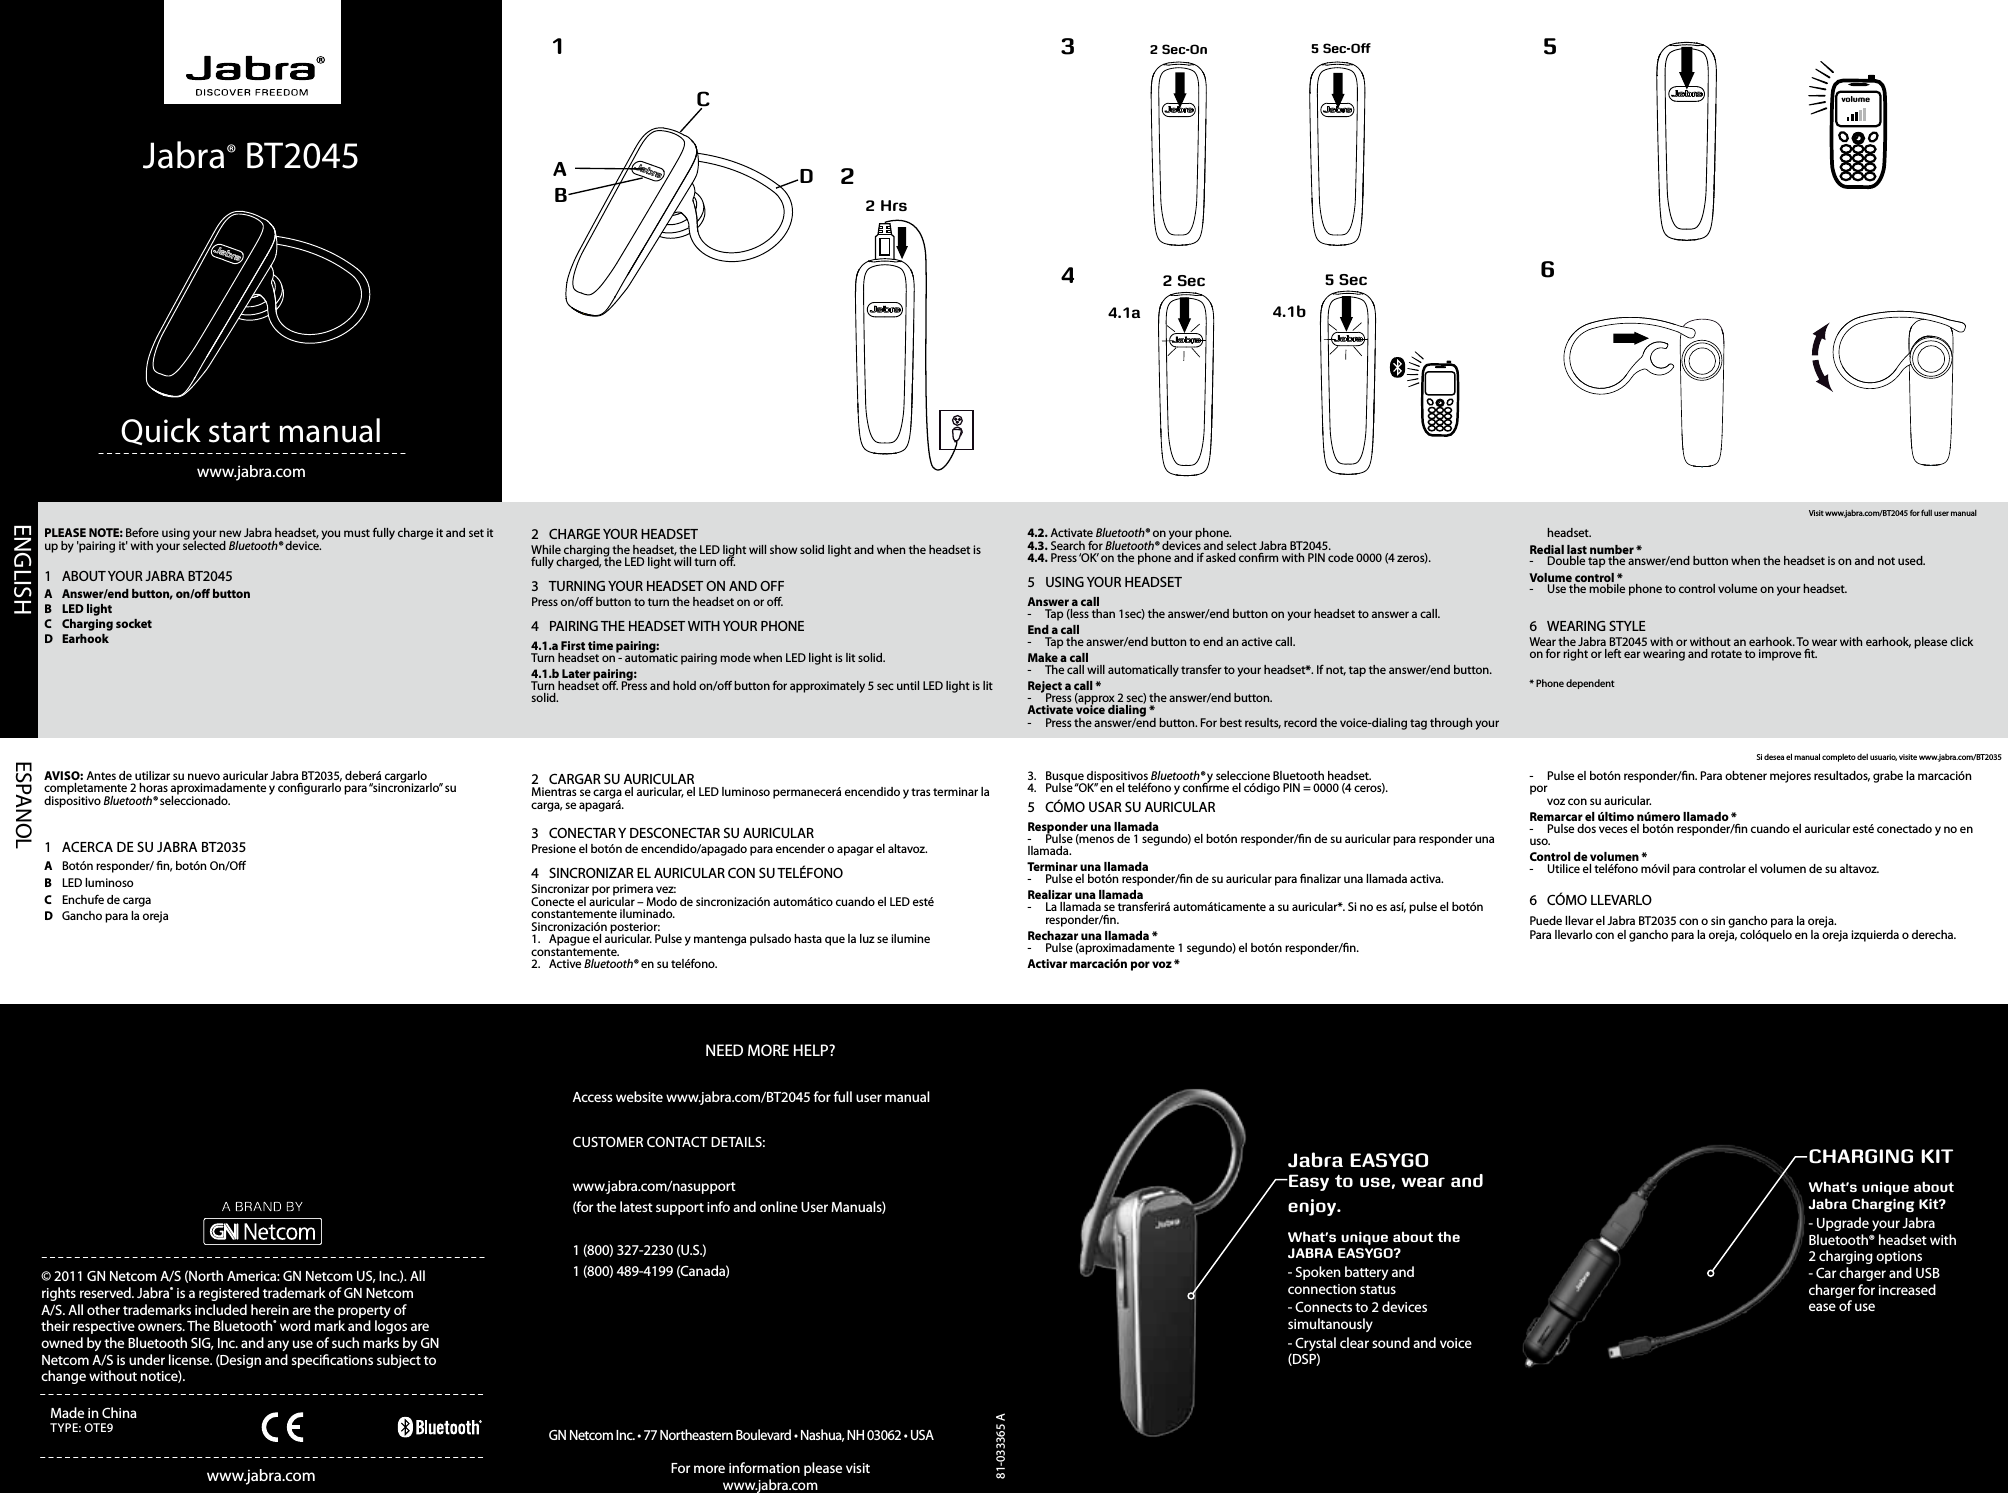 Gn Netcom Ote9 Jabra Ote9 Bluetooth Headset User Manual Jabra Ote9 Userman